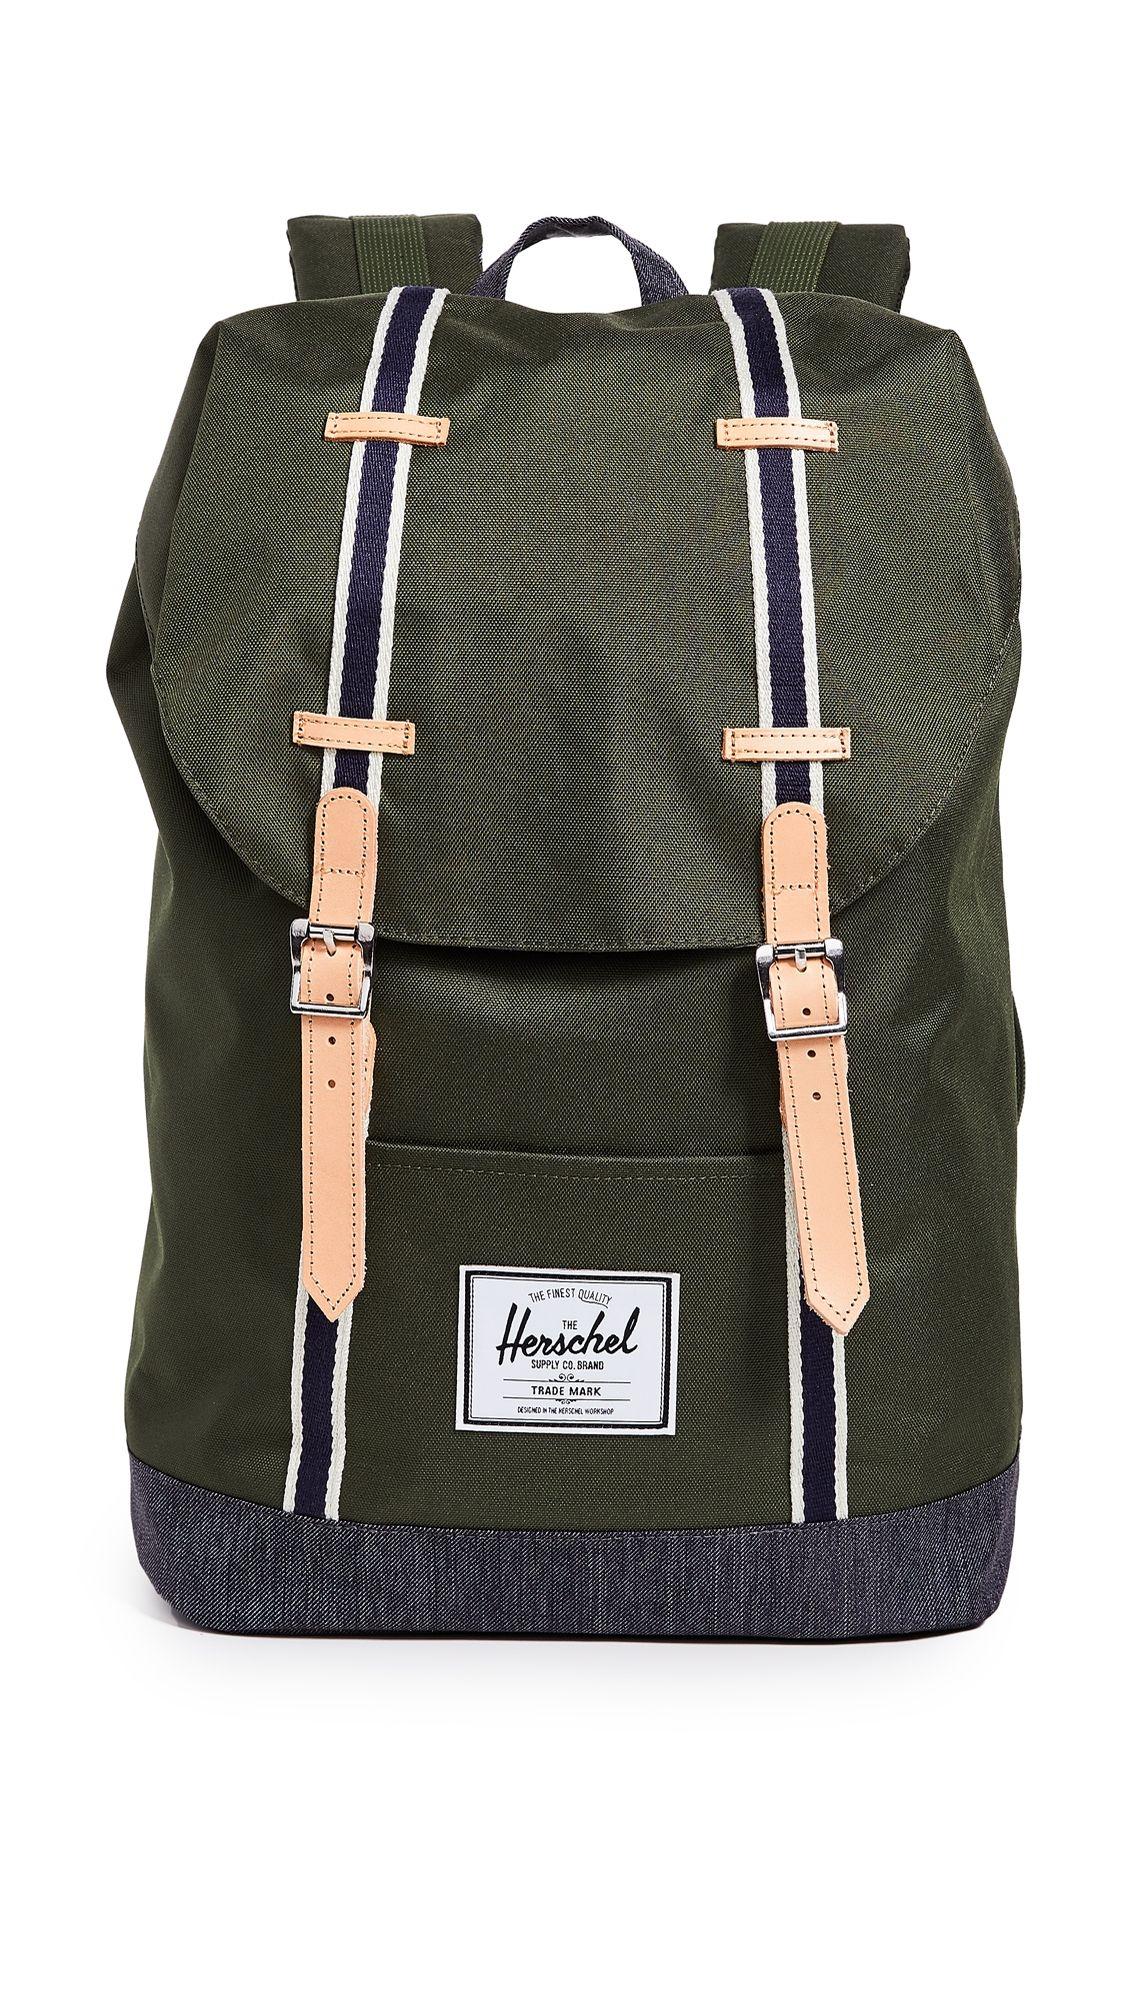 2ed42ffc4f9 HERSCHEL SUPPLY CO. RETREAT BACKPACK.  herschelsupplyco.  bags  leather   backpacks